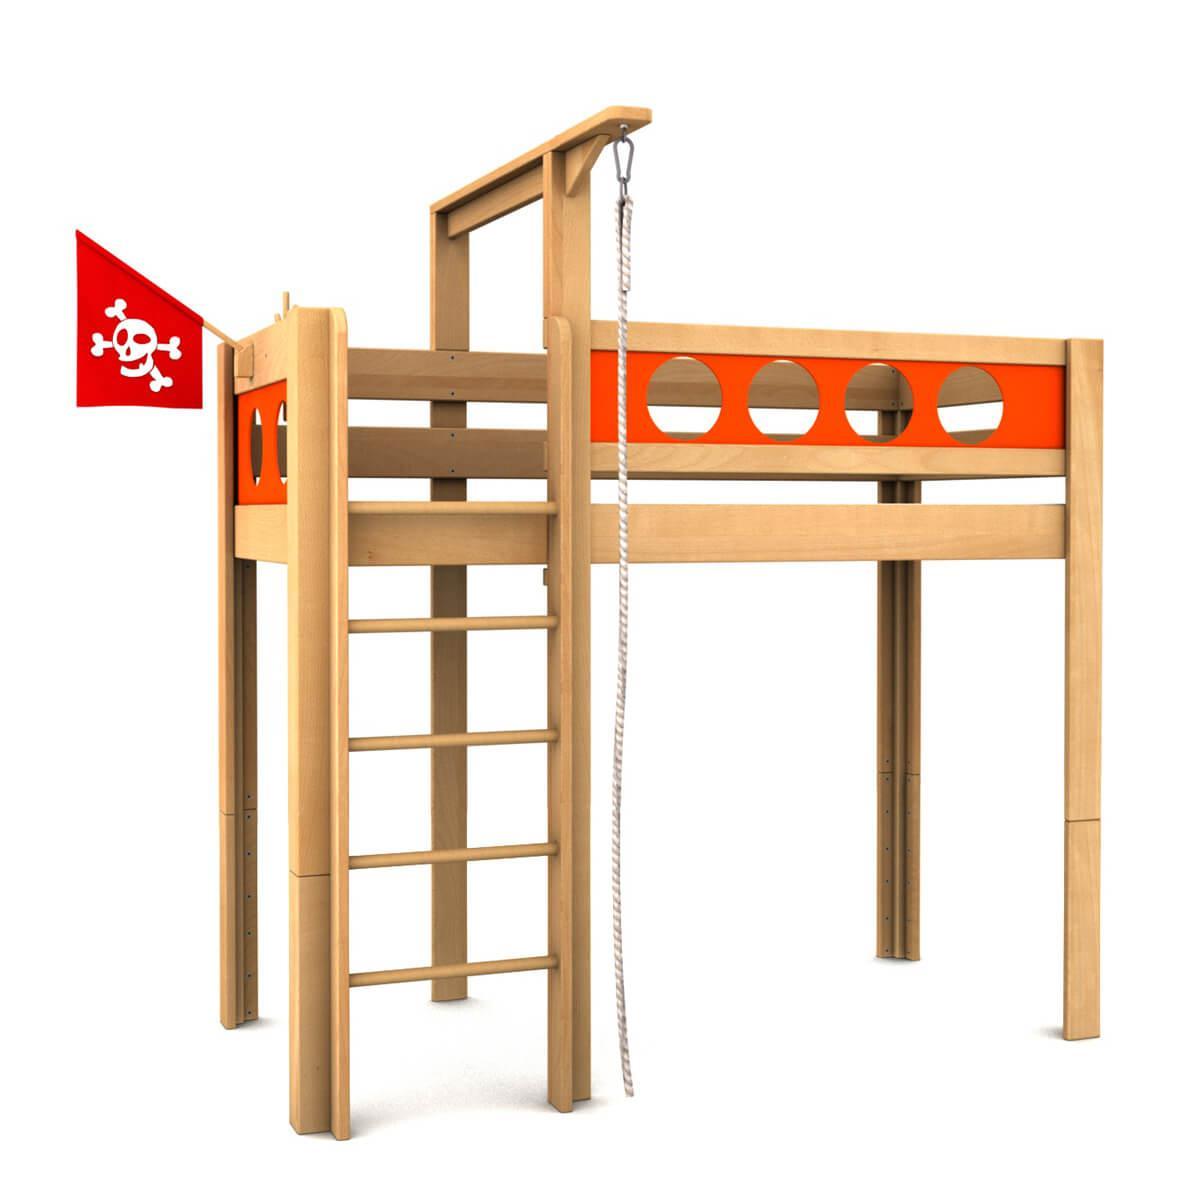 Lit mezzanine Pirat DELUXE de Breuyn bois huilé-orange